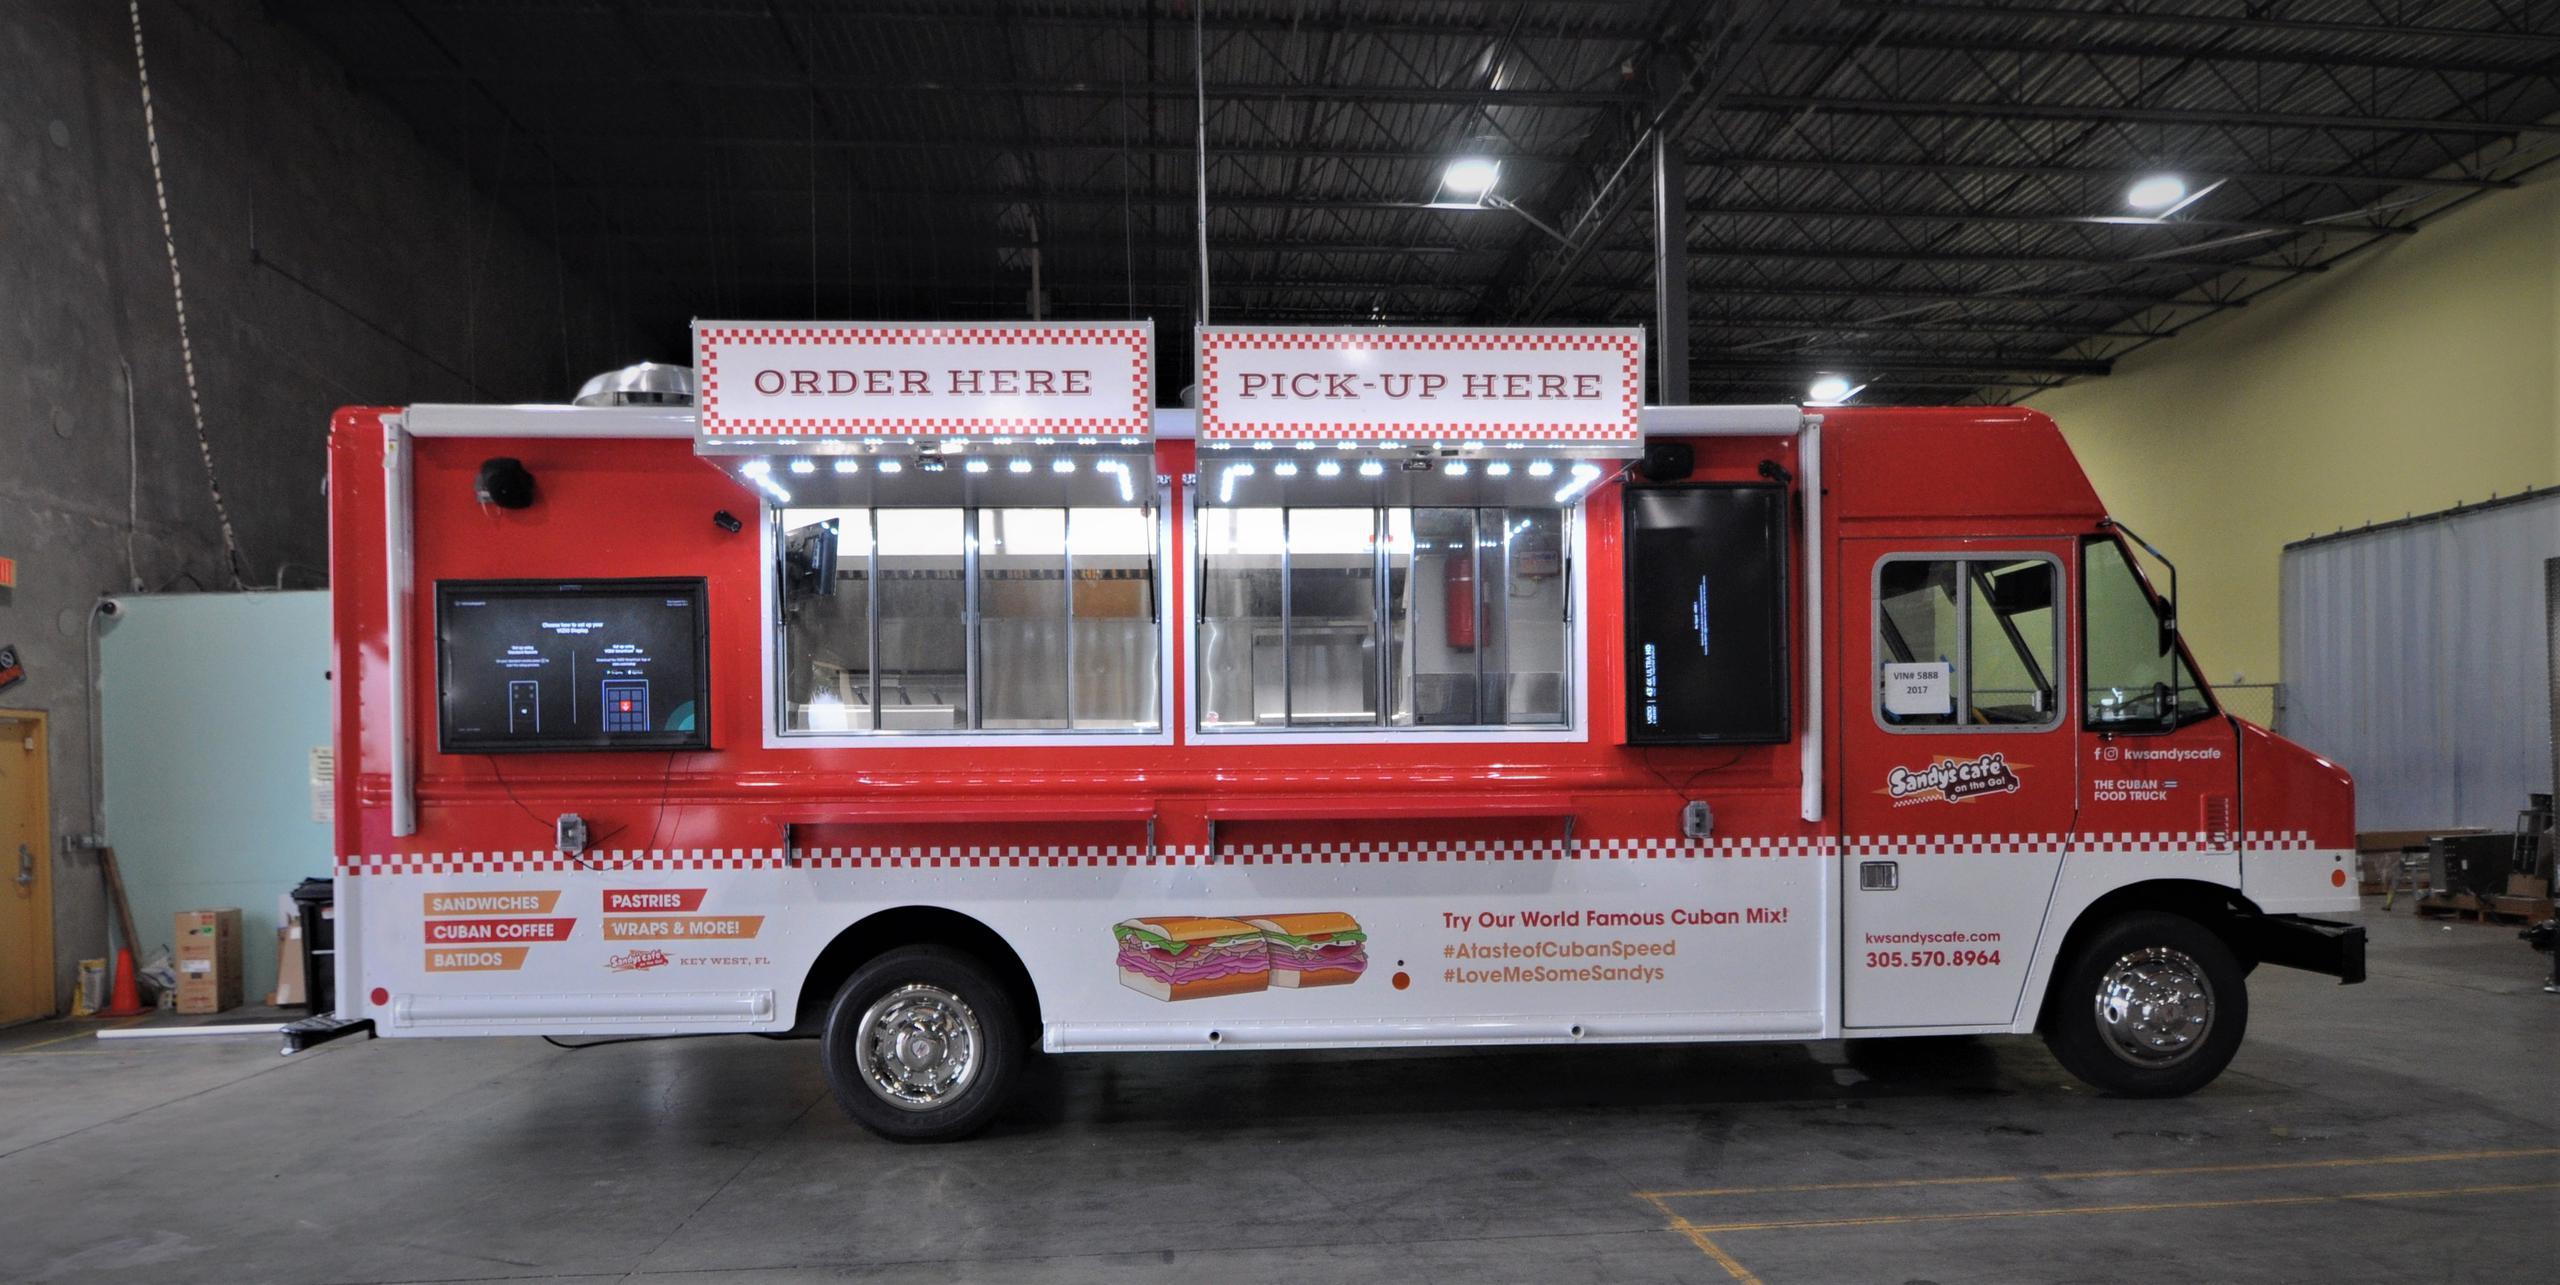 Preferred Design an impressive, mouth-watering food truck menu board - The  UH49